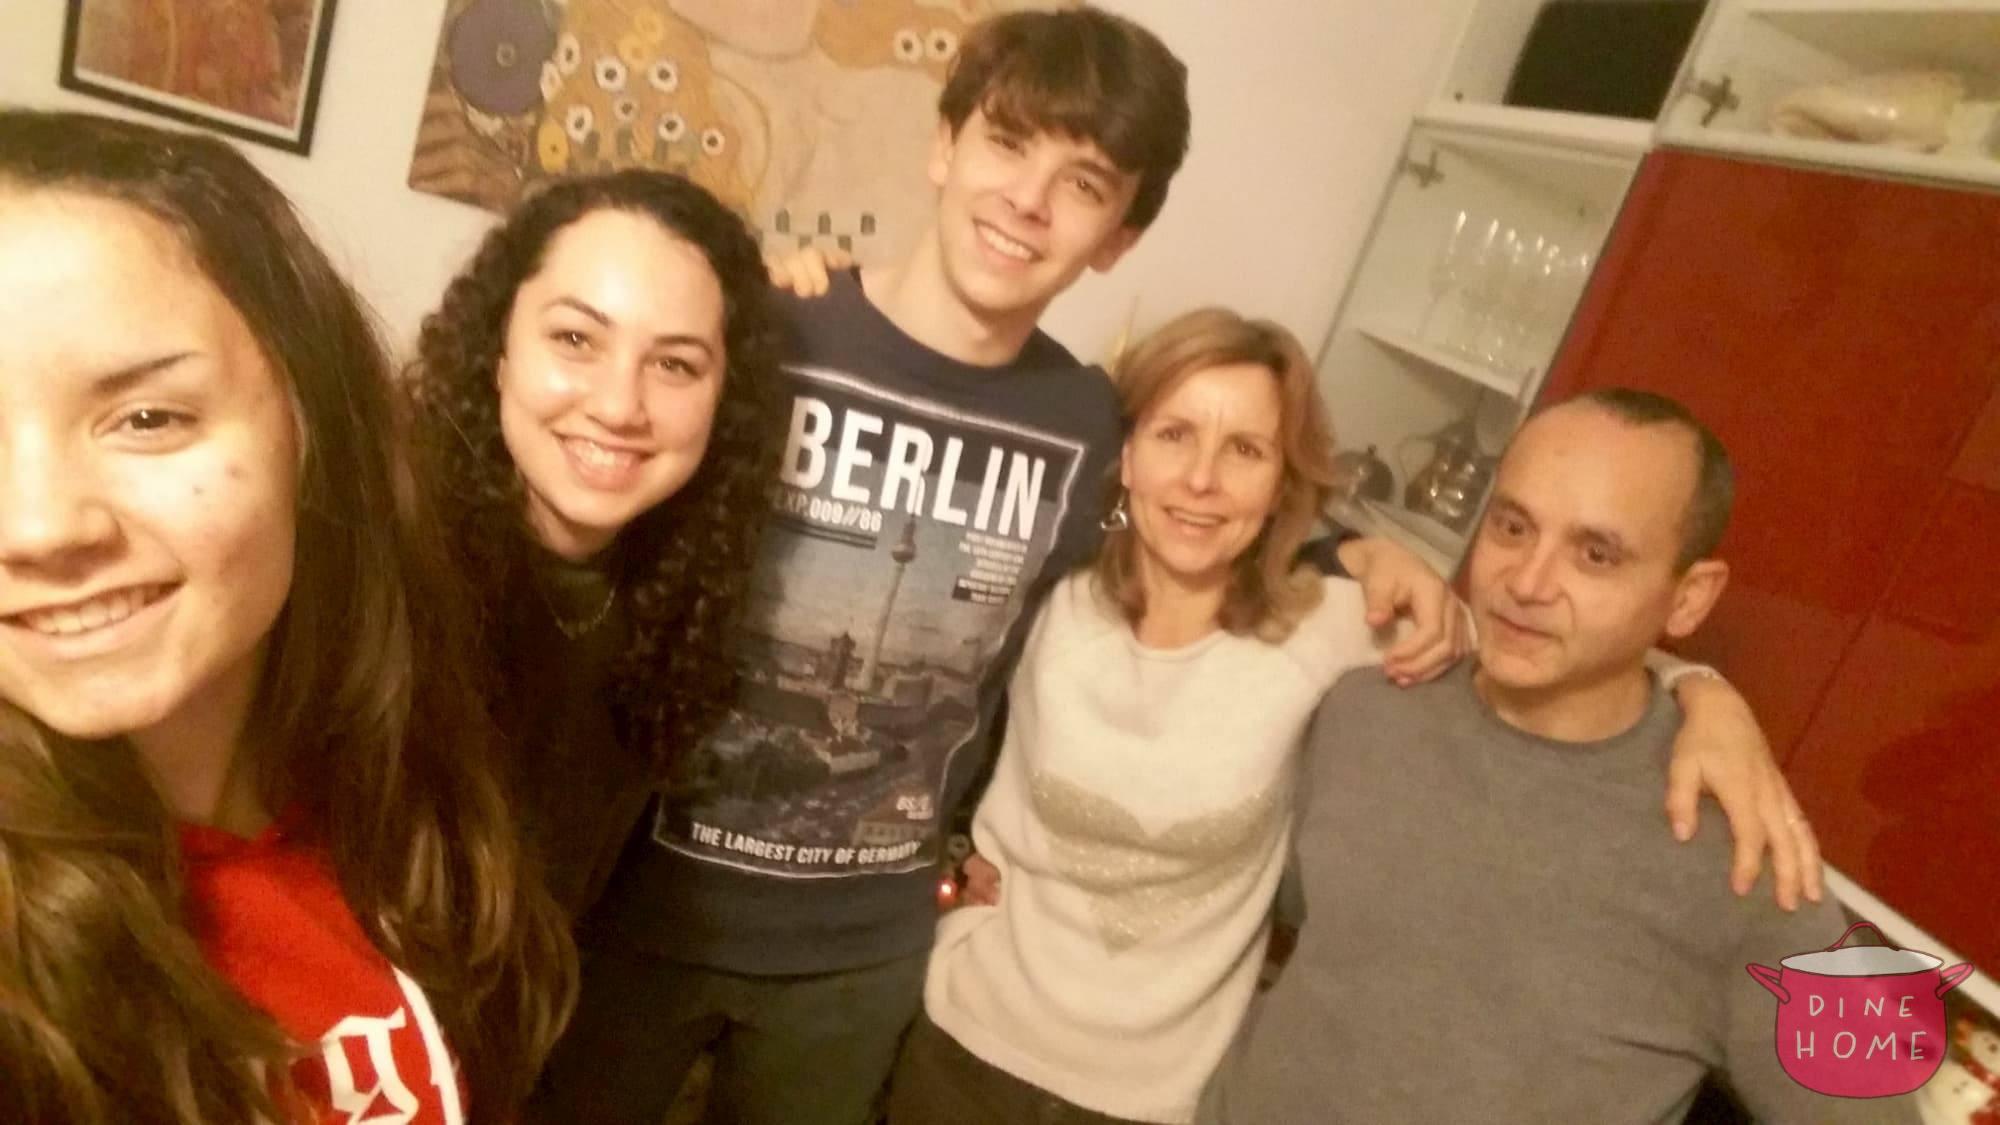 Noah, studentessa da Israele, a cena dalla sua famiglia Dinehome.